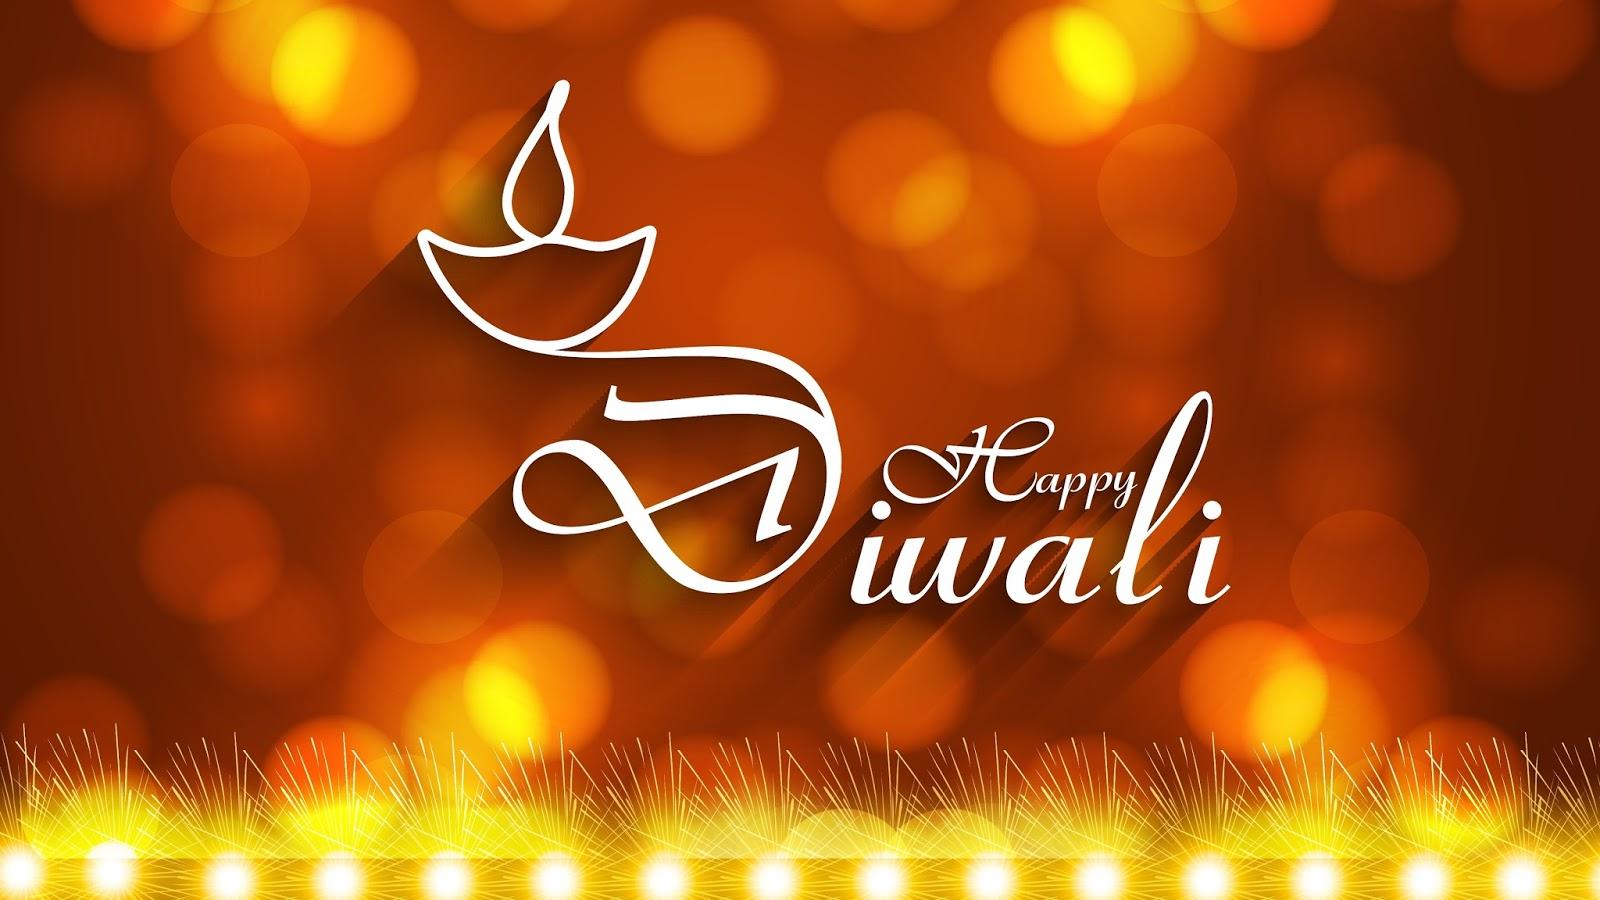 happy diwali hd wallpapers - photo #36